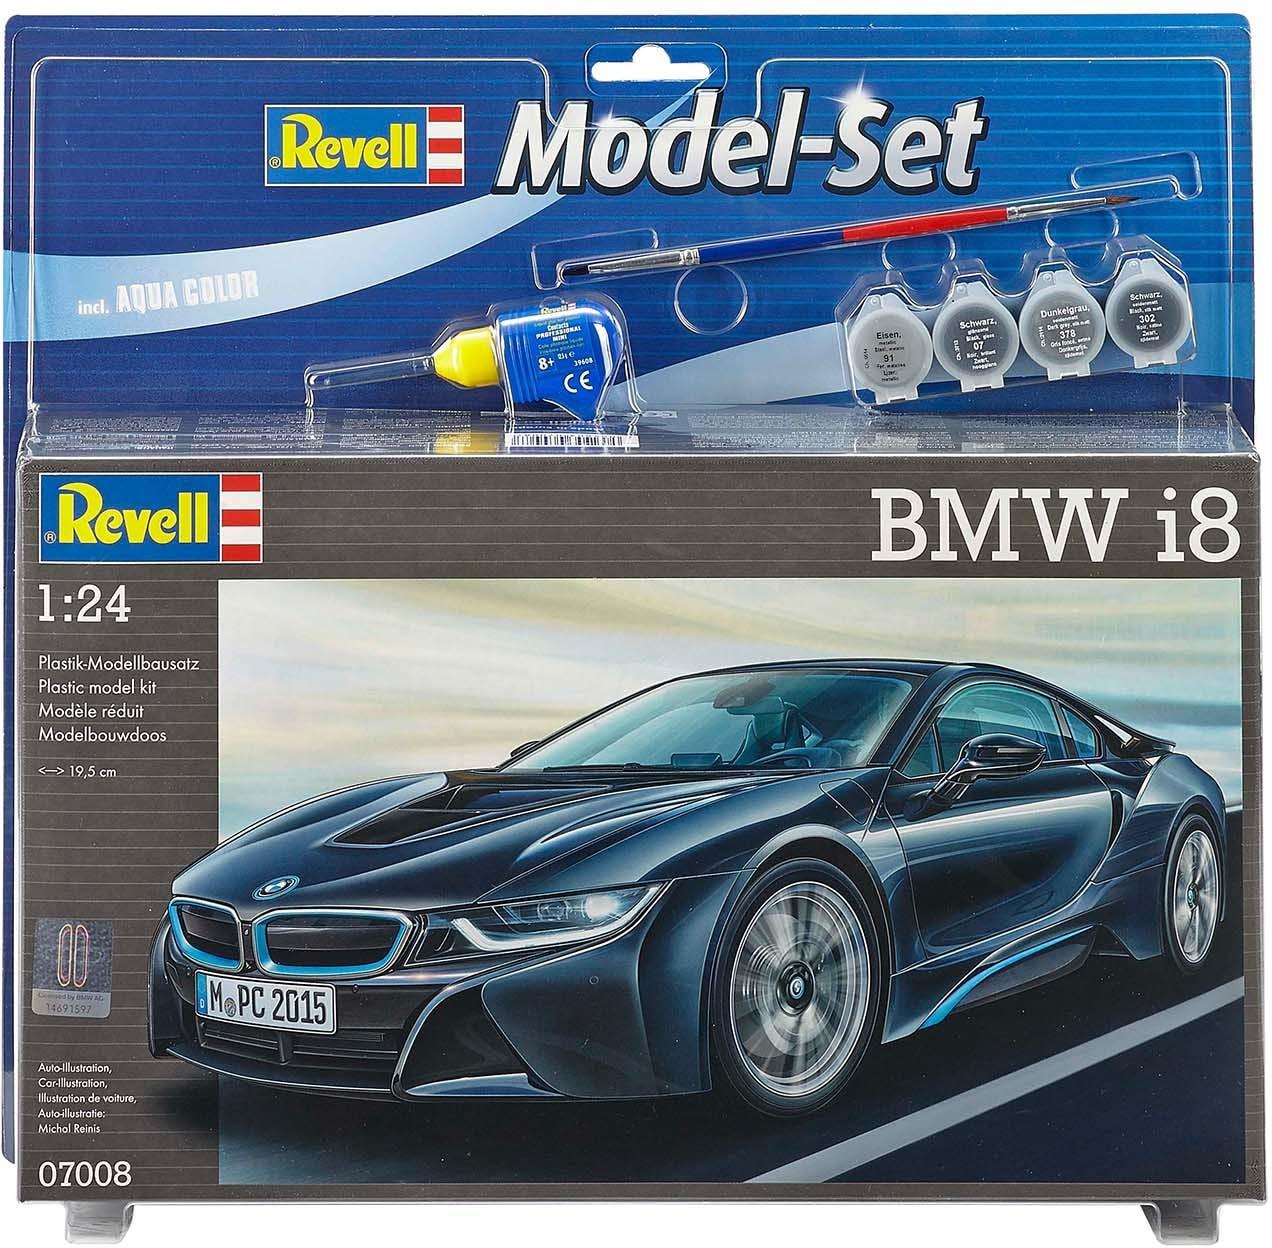 Revell® Plastik-Modellbausatz Auto mit Zubehör, Maßstab 1:24,  Model Set BMW i8  Preisvergleich